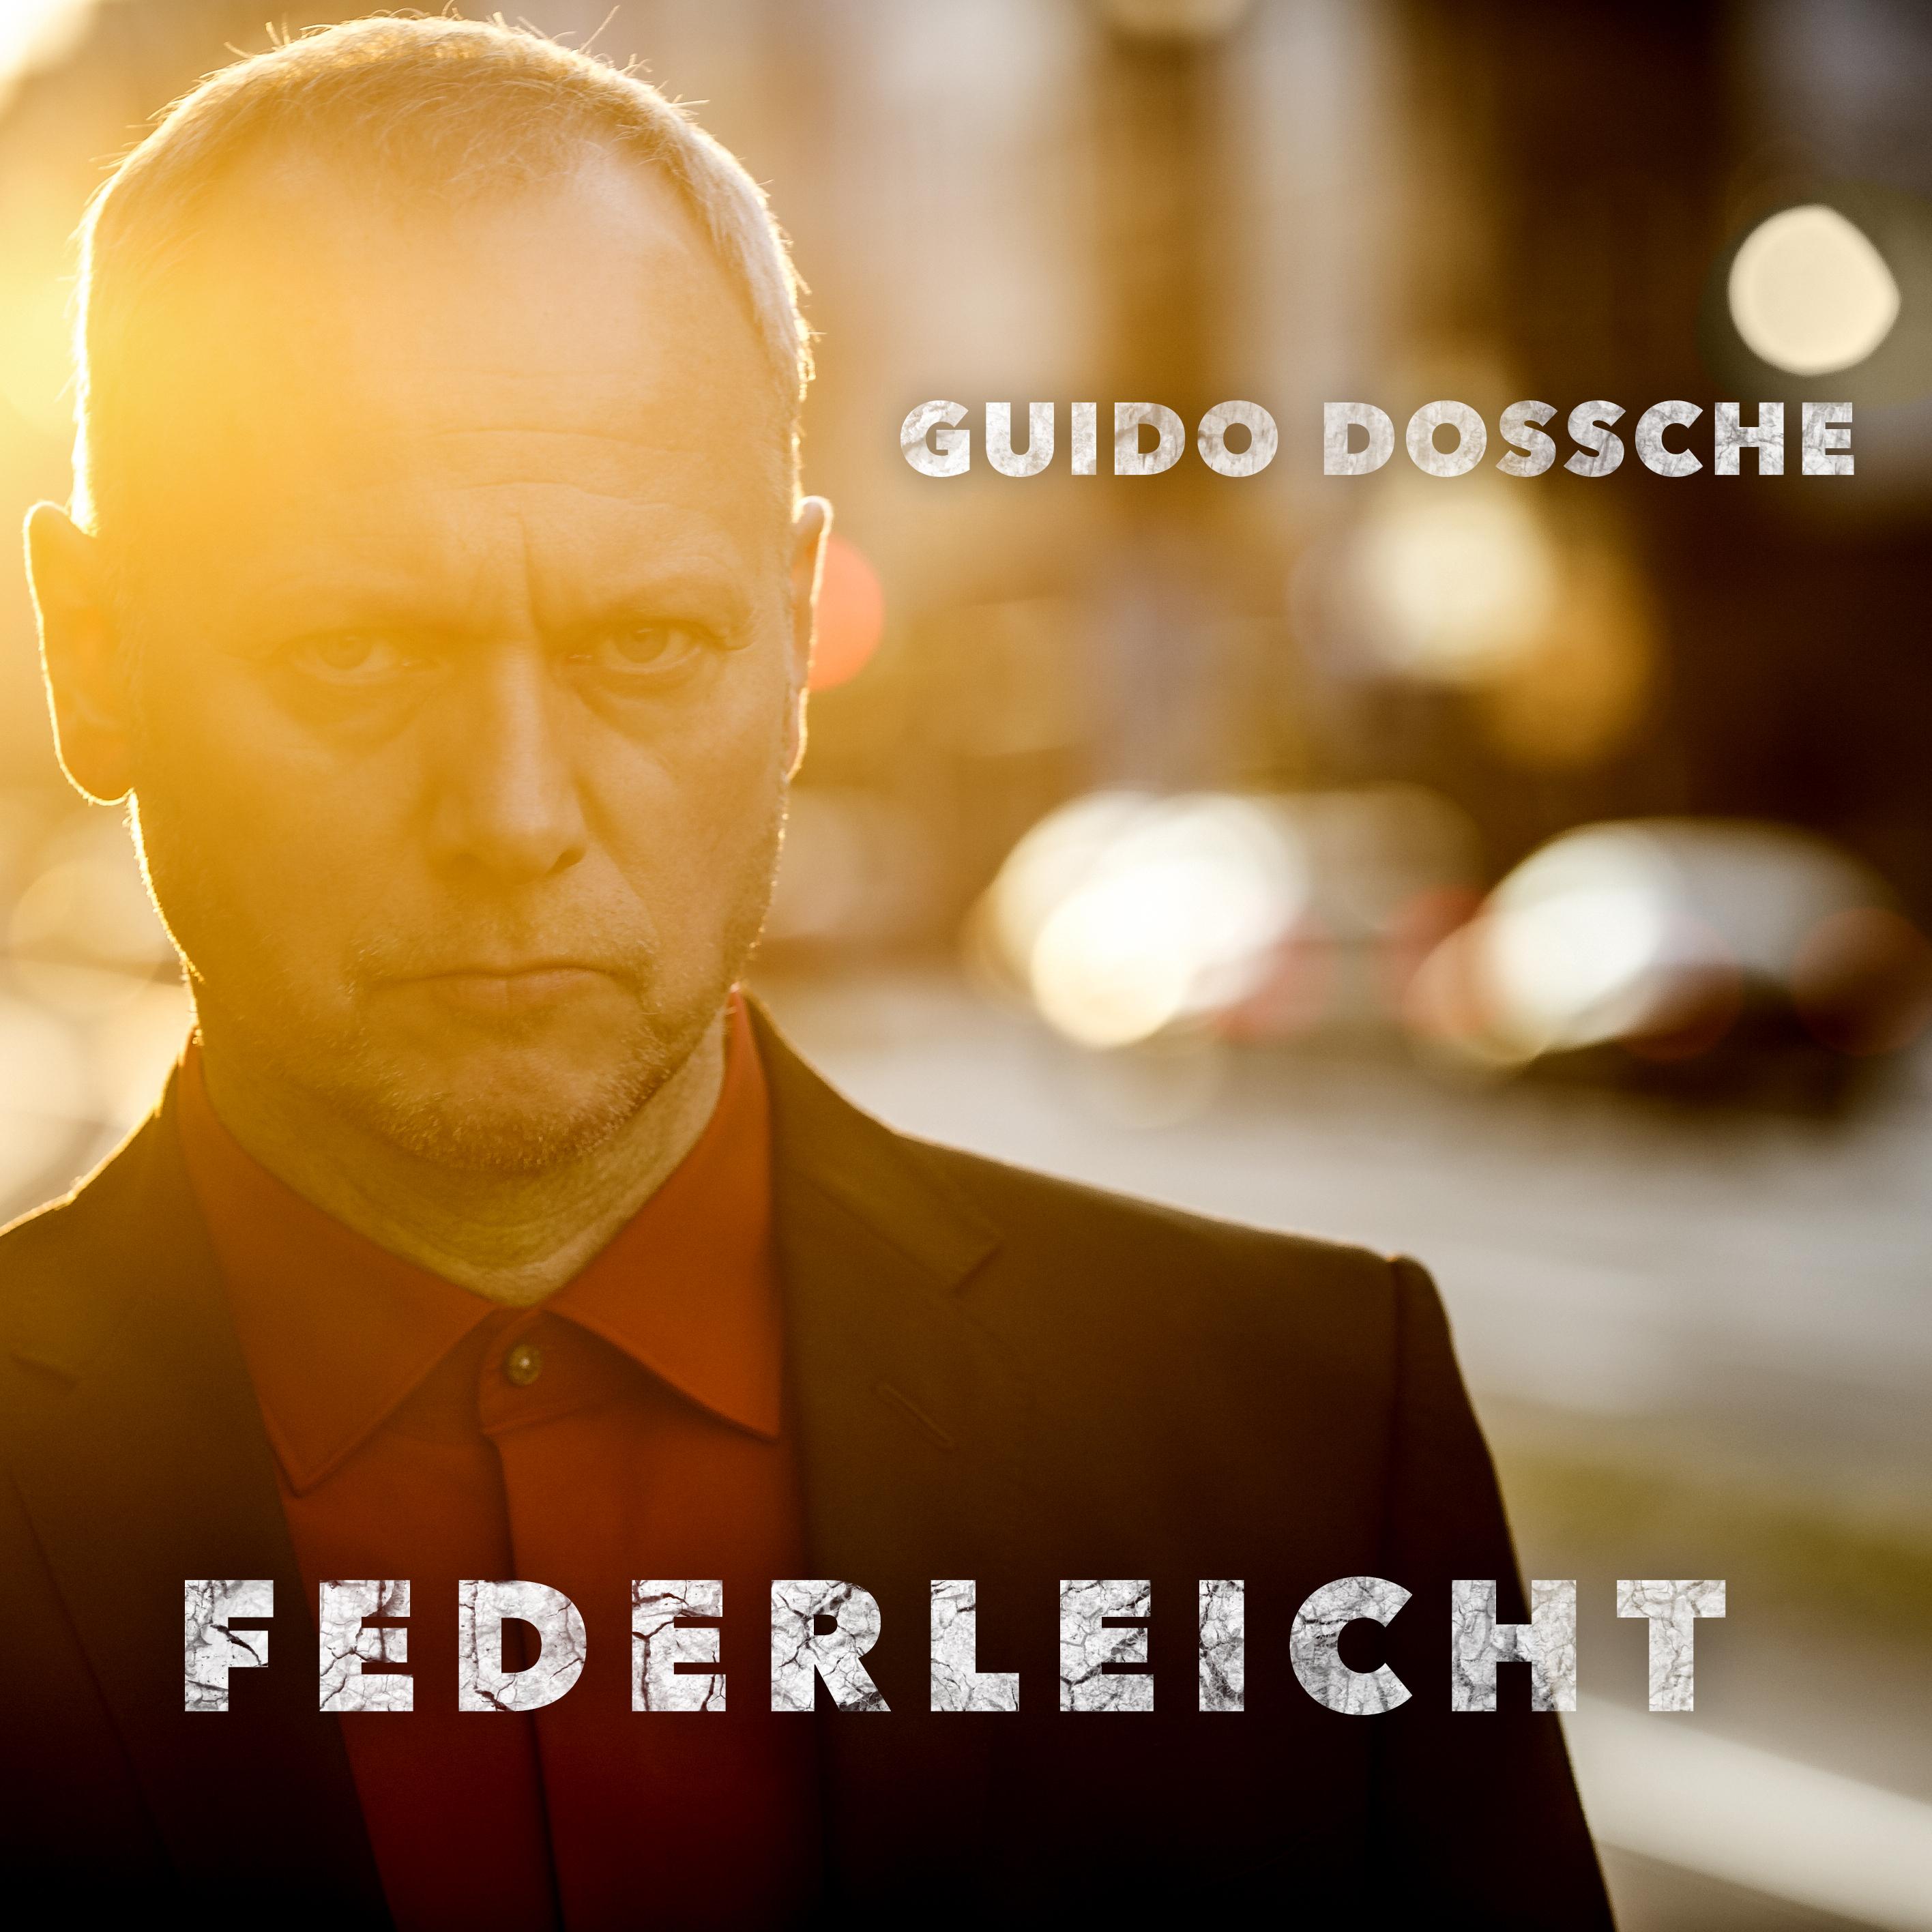 Guido Dossche - Federleicht